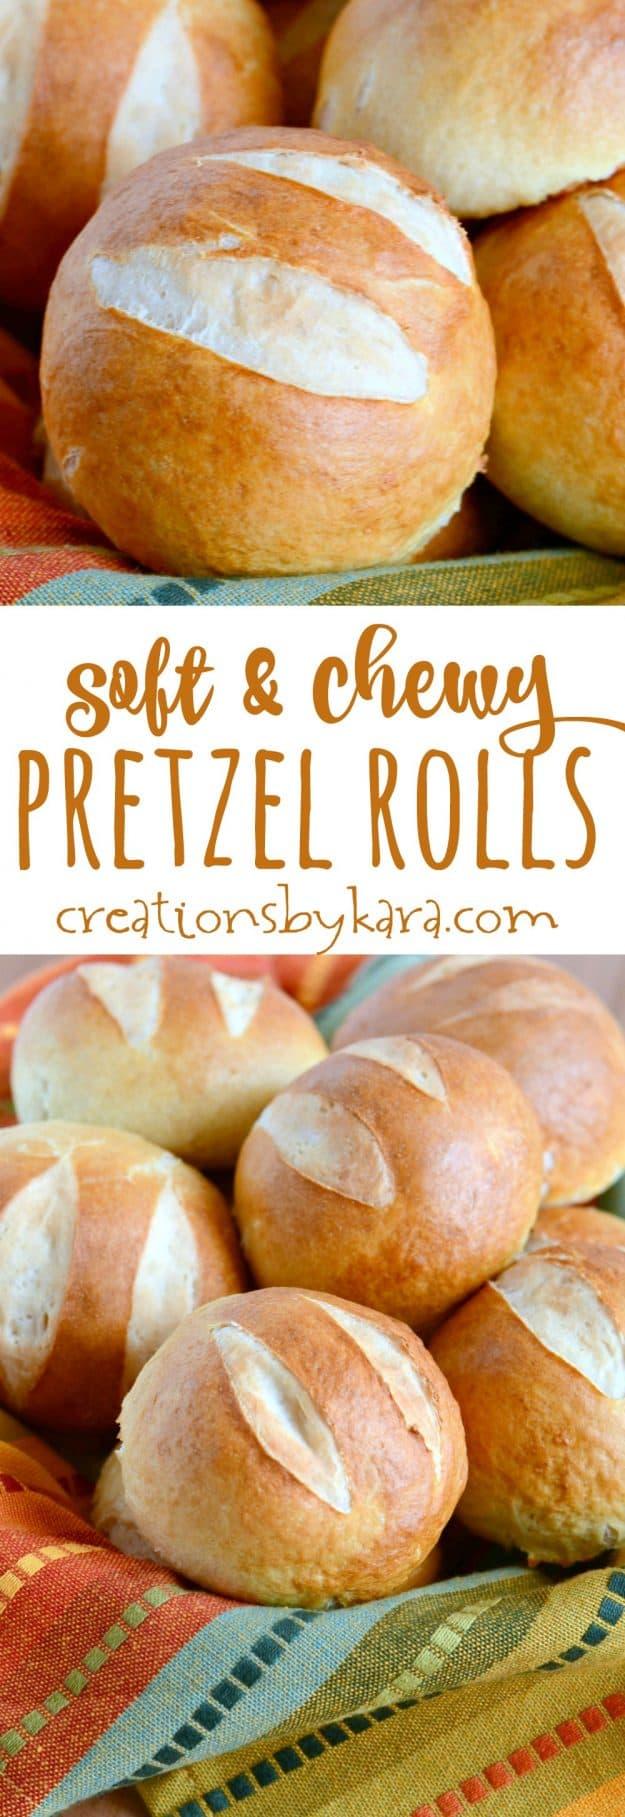 Chewy pretzel rolls recipe collage